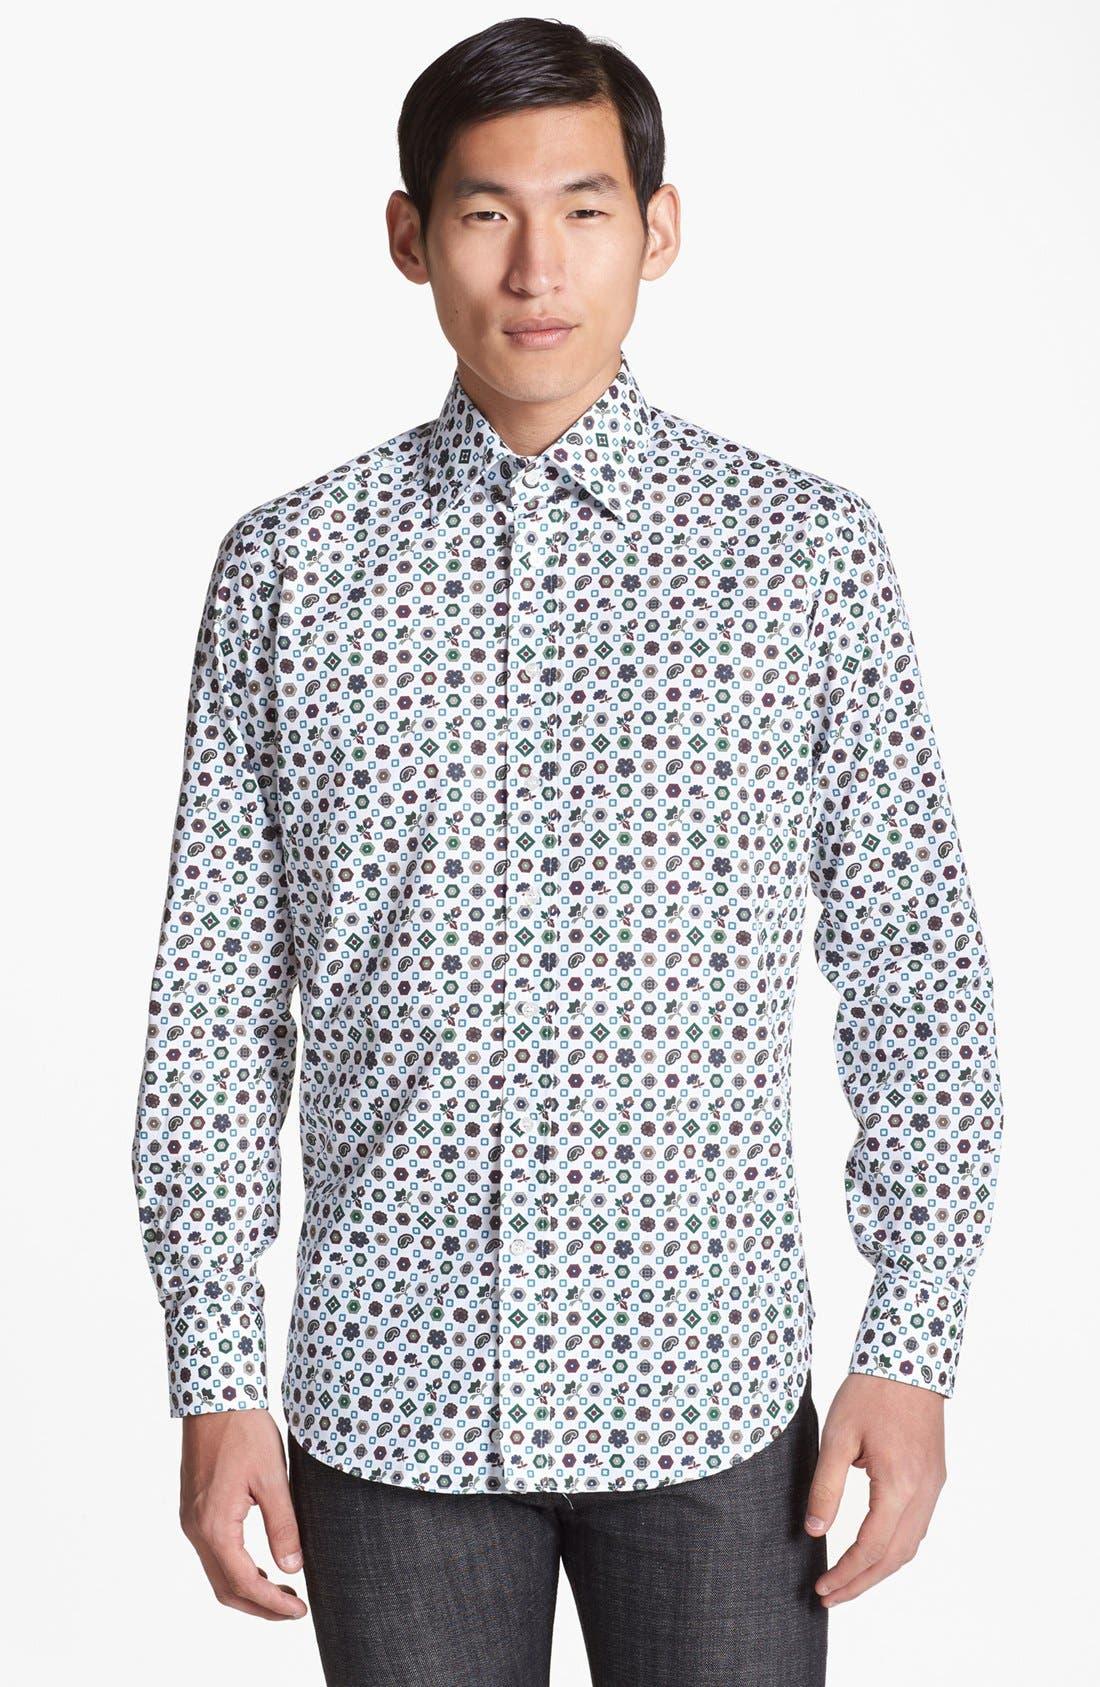 Main Image - Etro Geometric Medallion Print Cotton Shirt